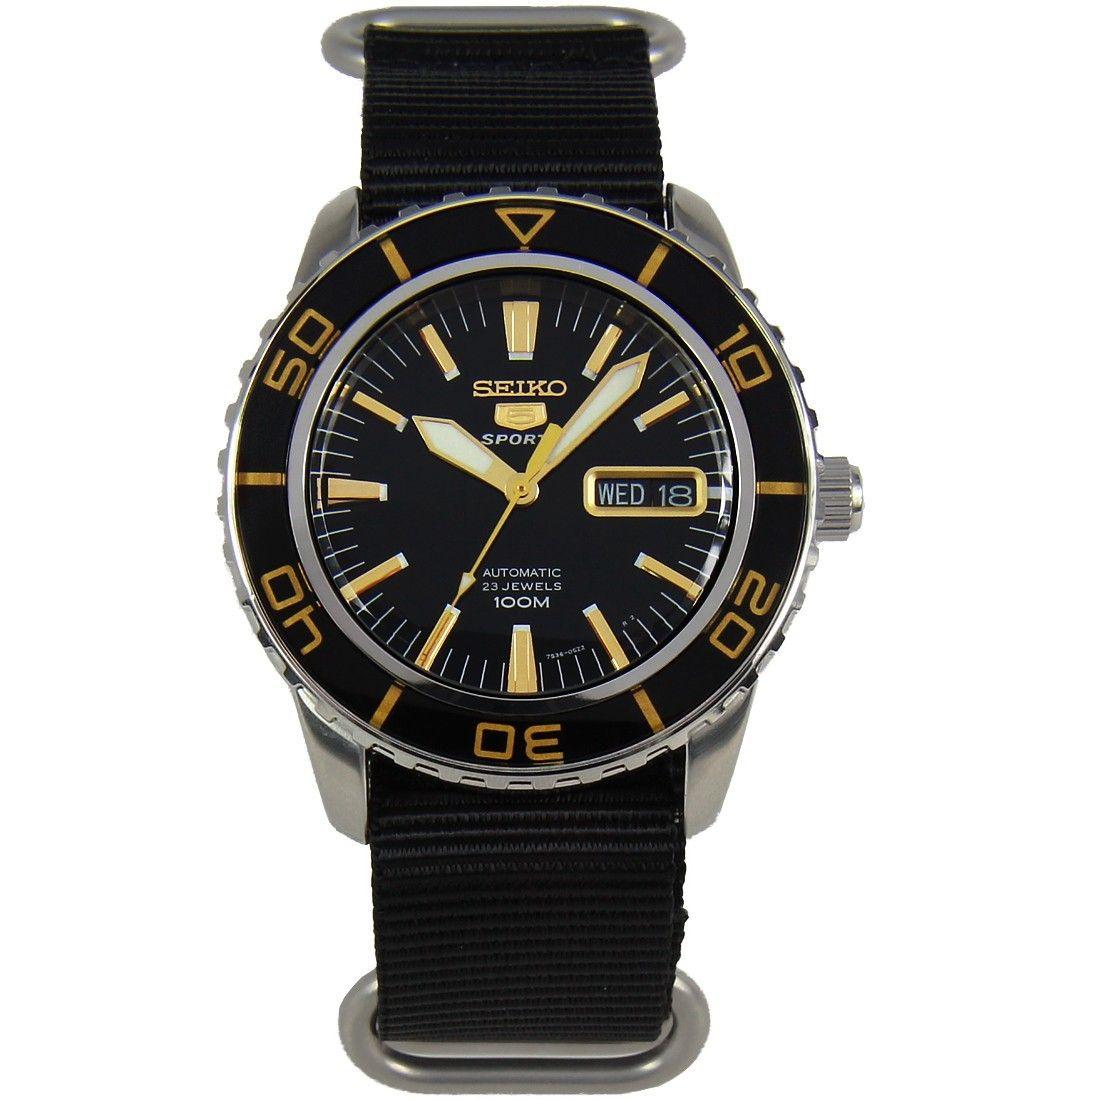 SNZH57K1 Seiko 5 Sports Automatic Watch w/ add'l strap in